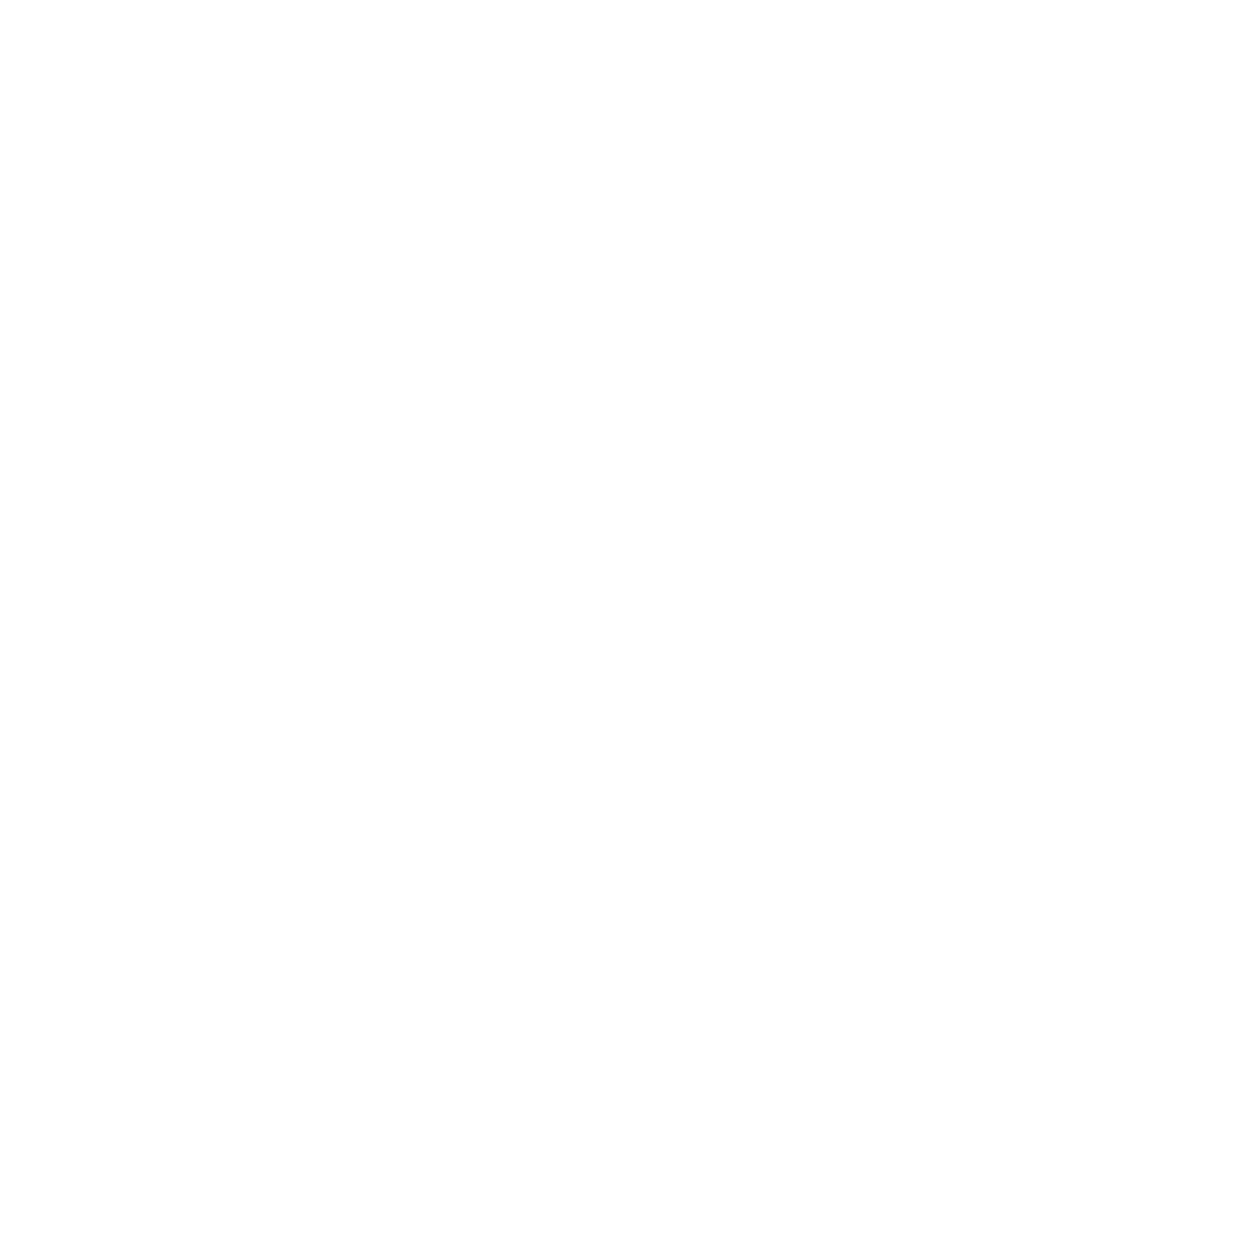 FOREVER PIZZA